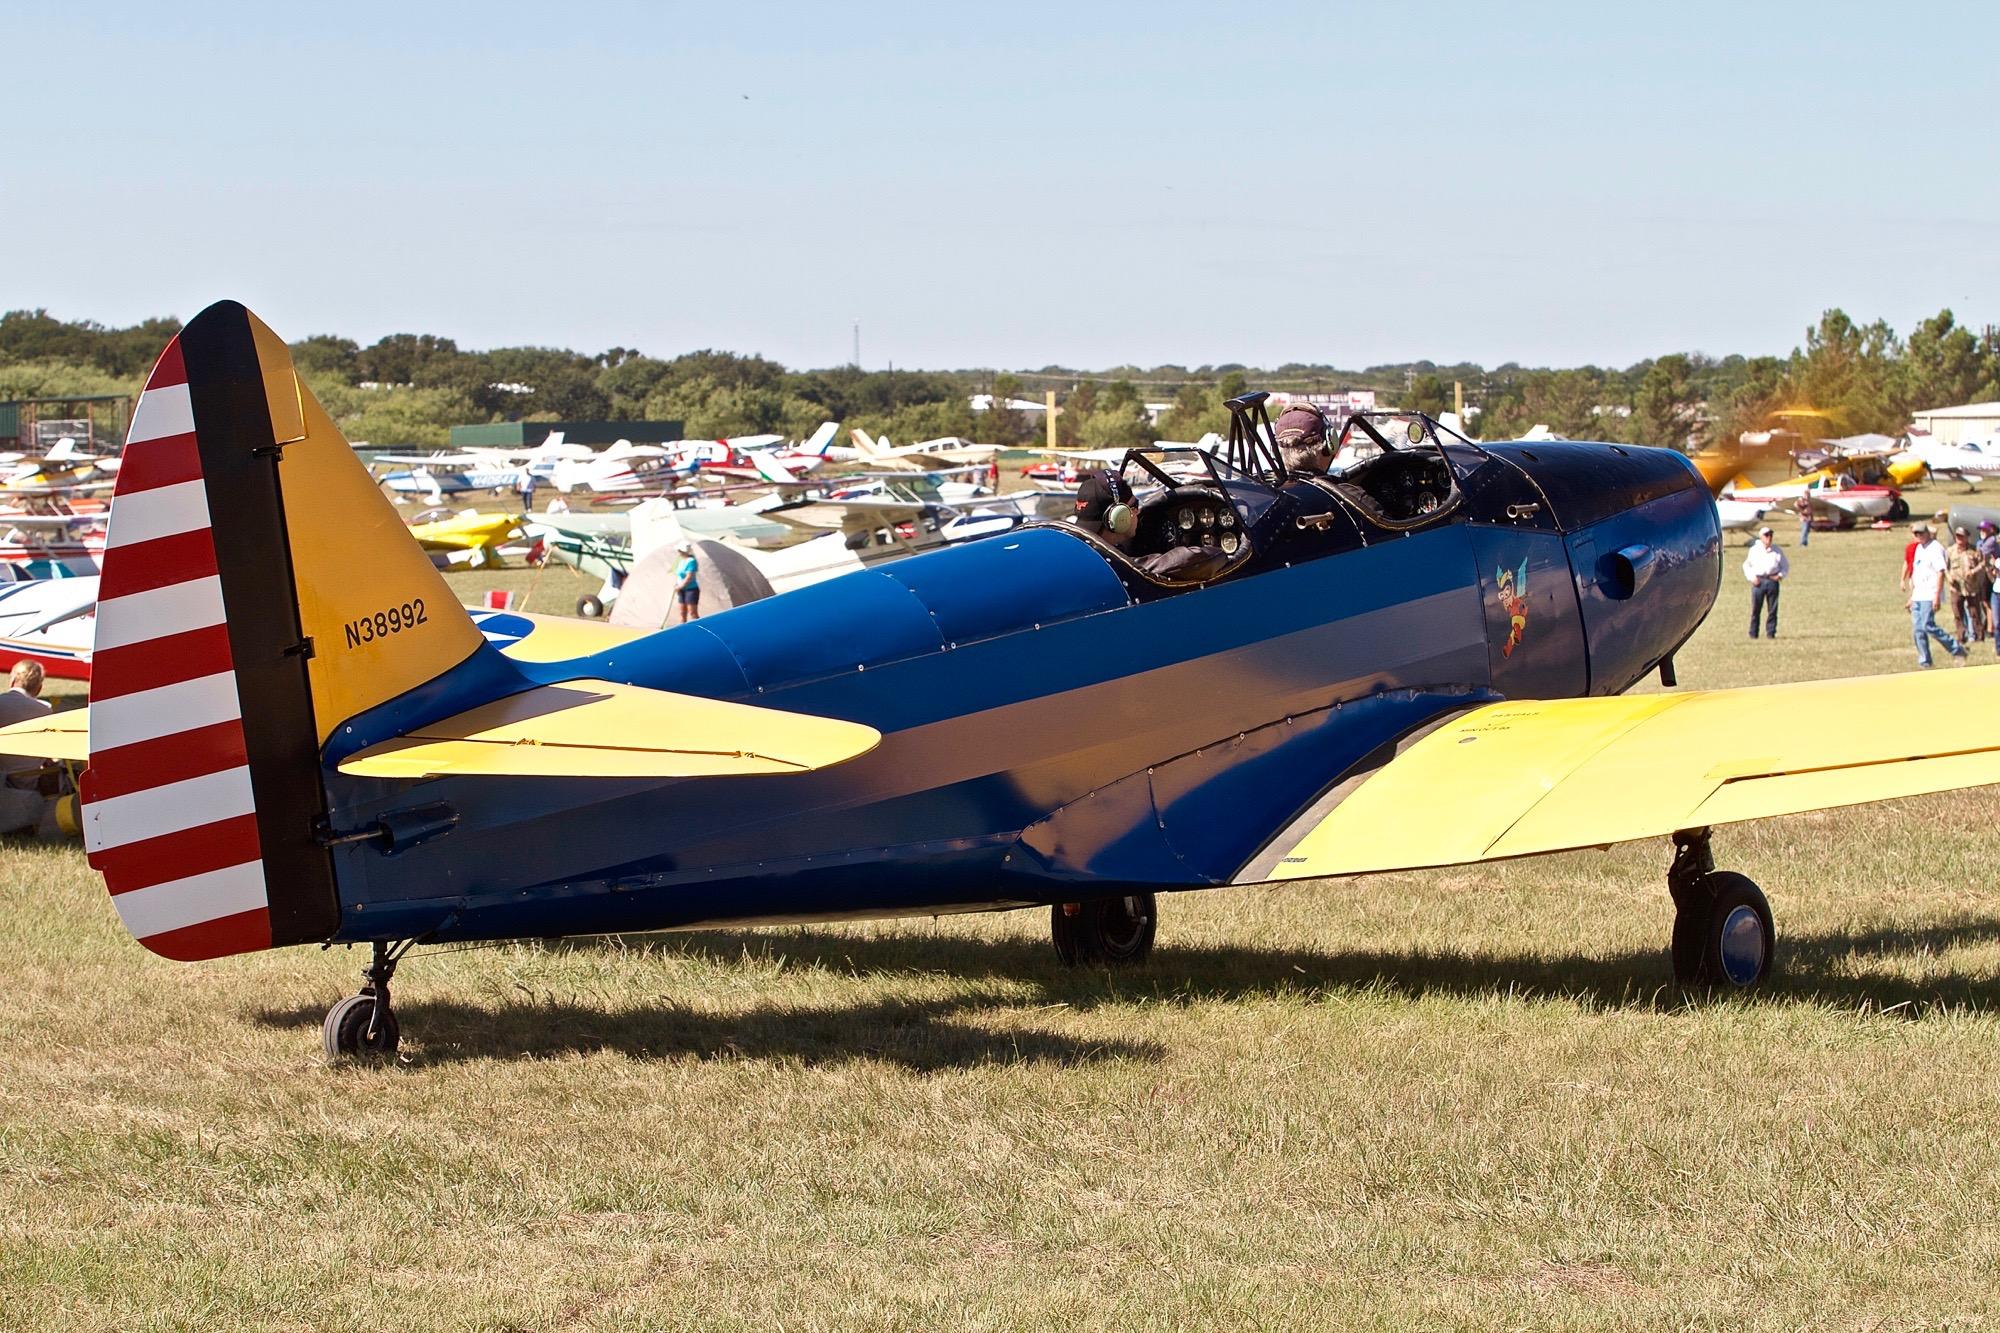 Airshow | Ranger Airfield